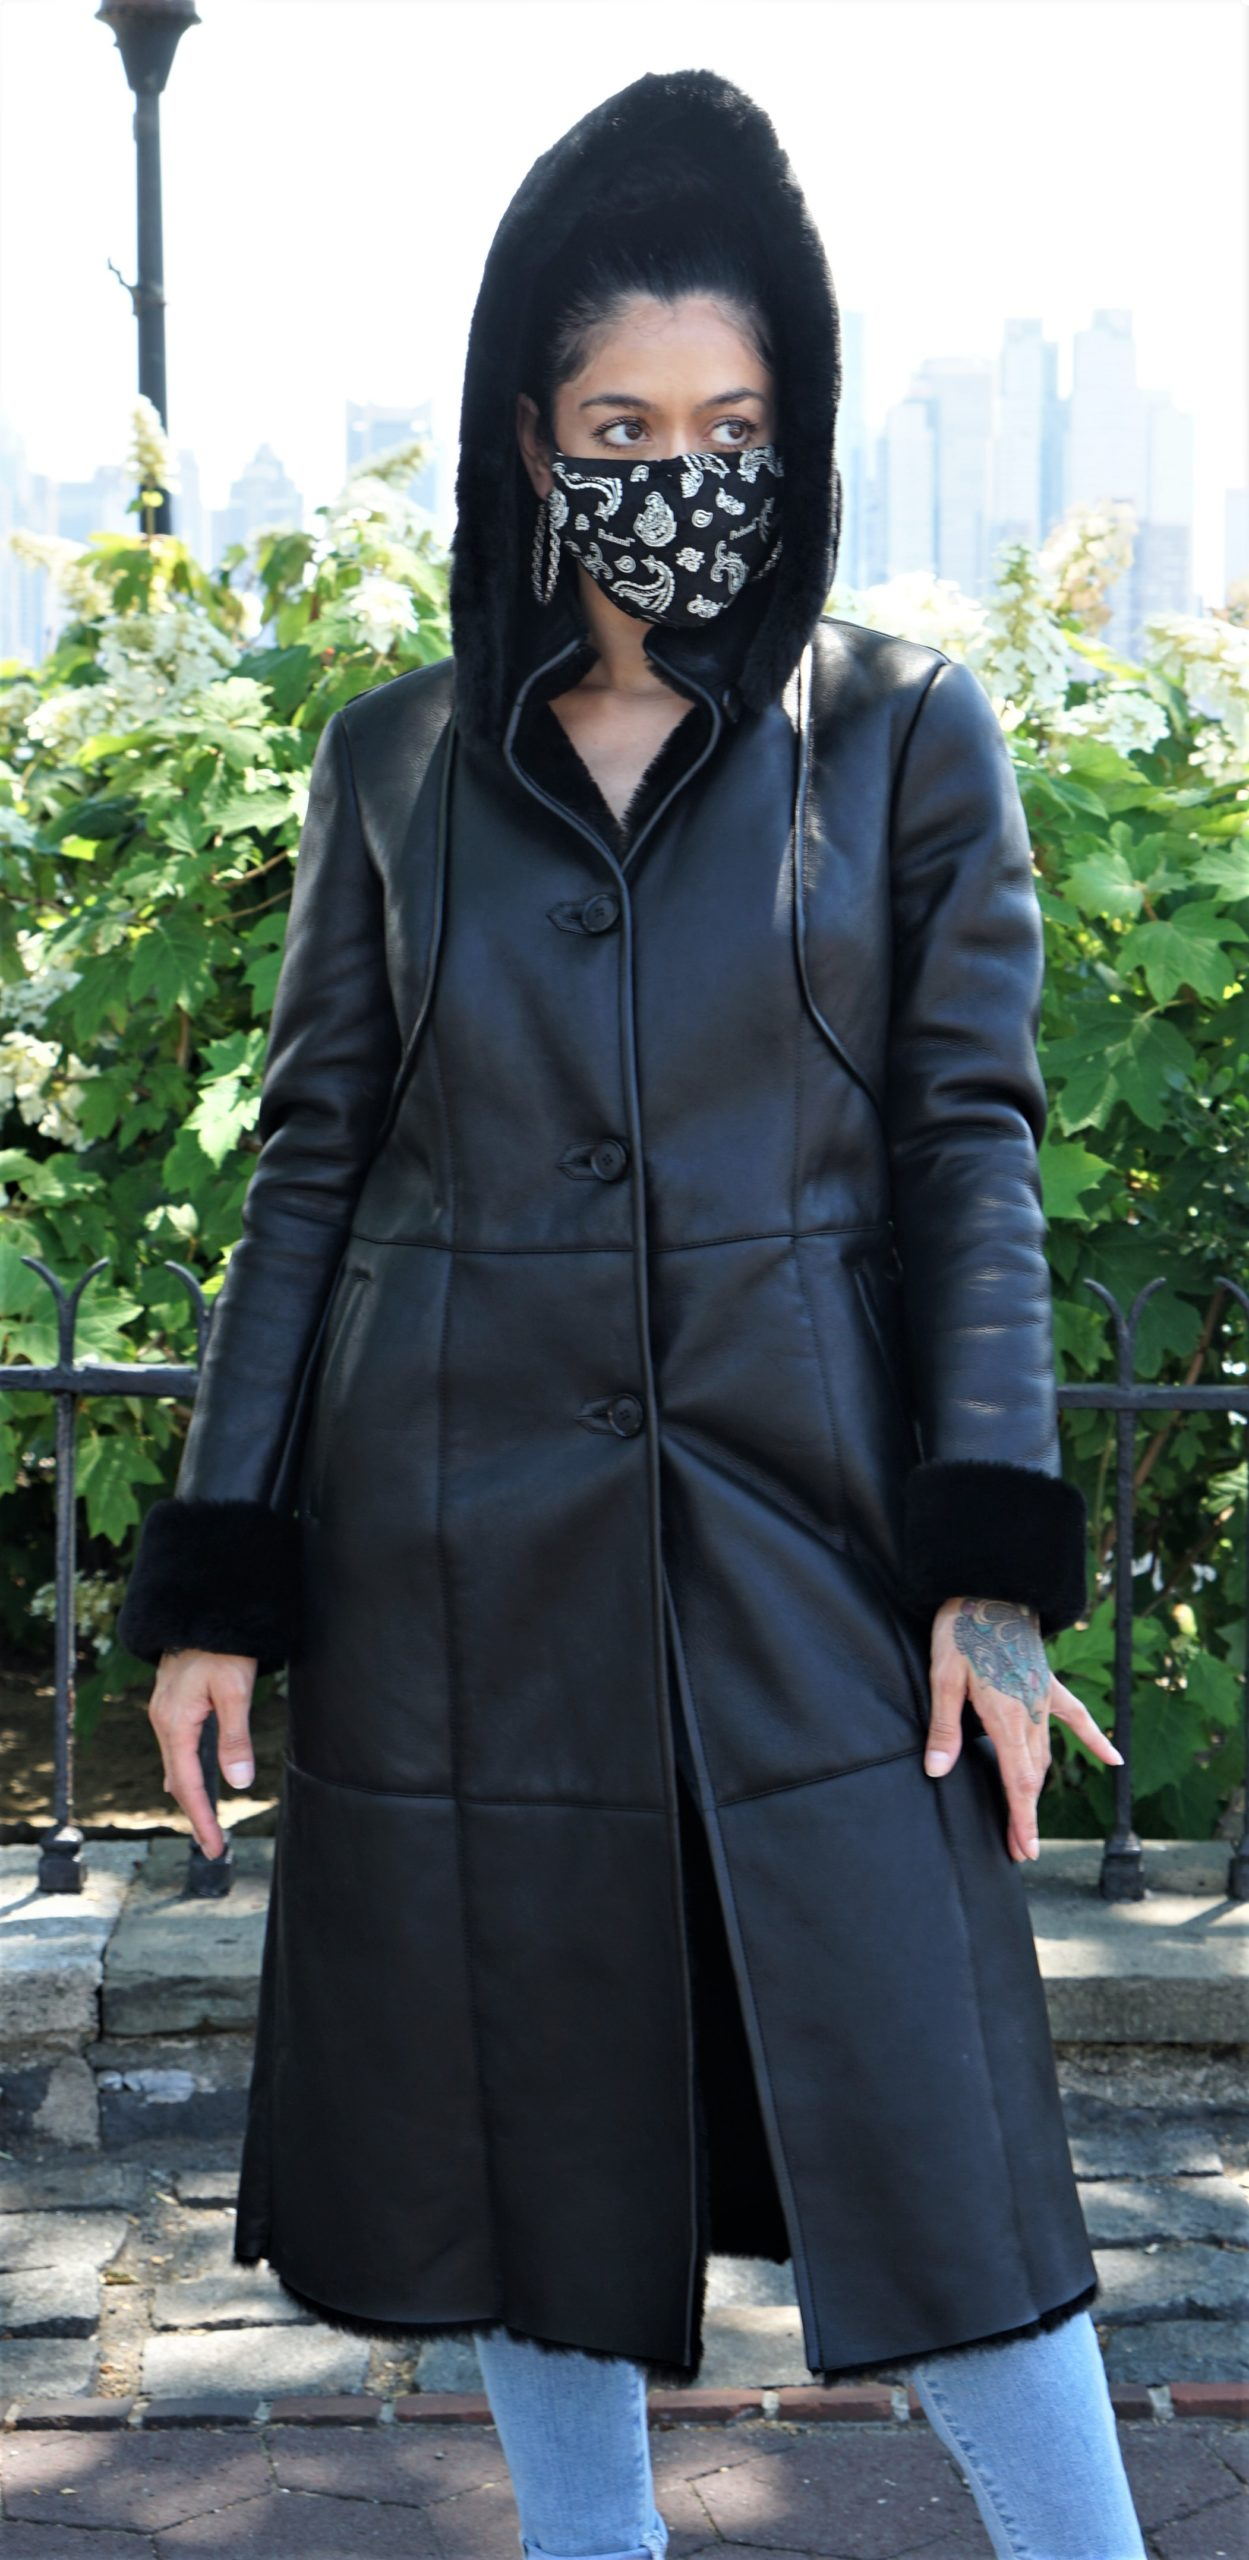 Women's Black Shearling Coat